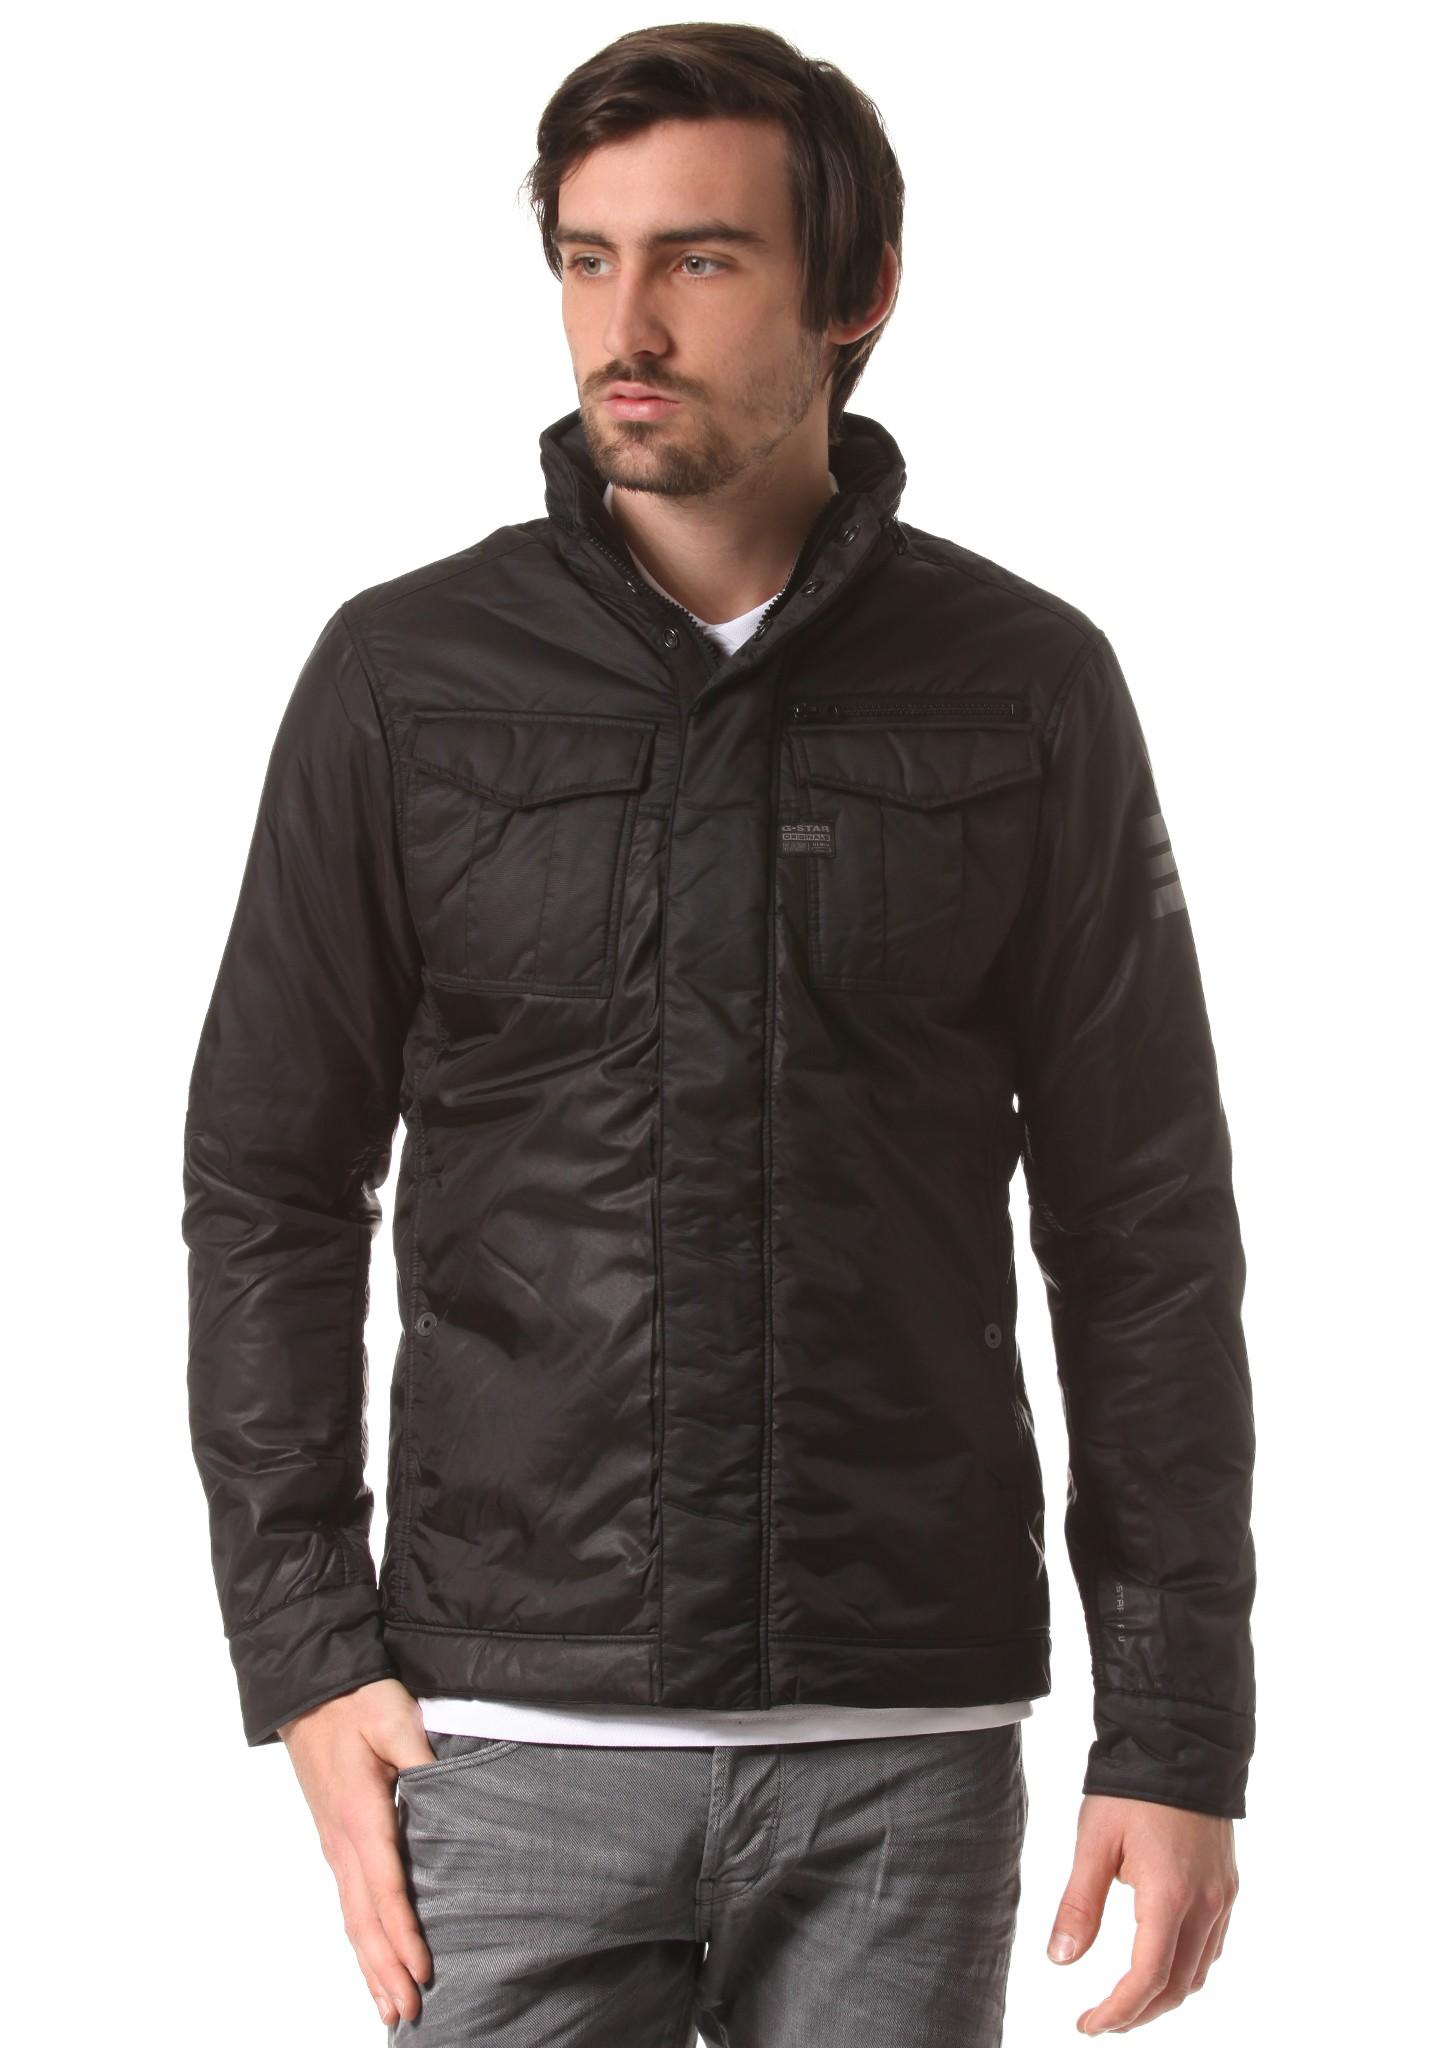 neu g star rovic overshirt l s jacket herren jacke ebay. Black Bedroom Furniture Sets. Home Design Ideas